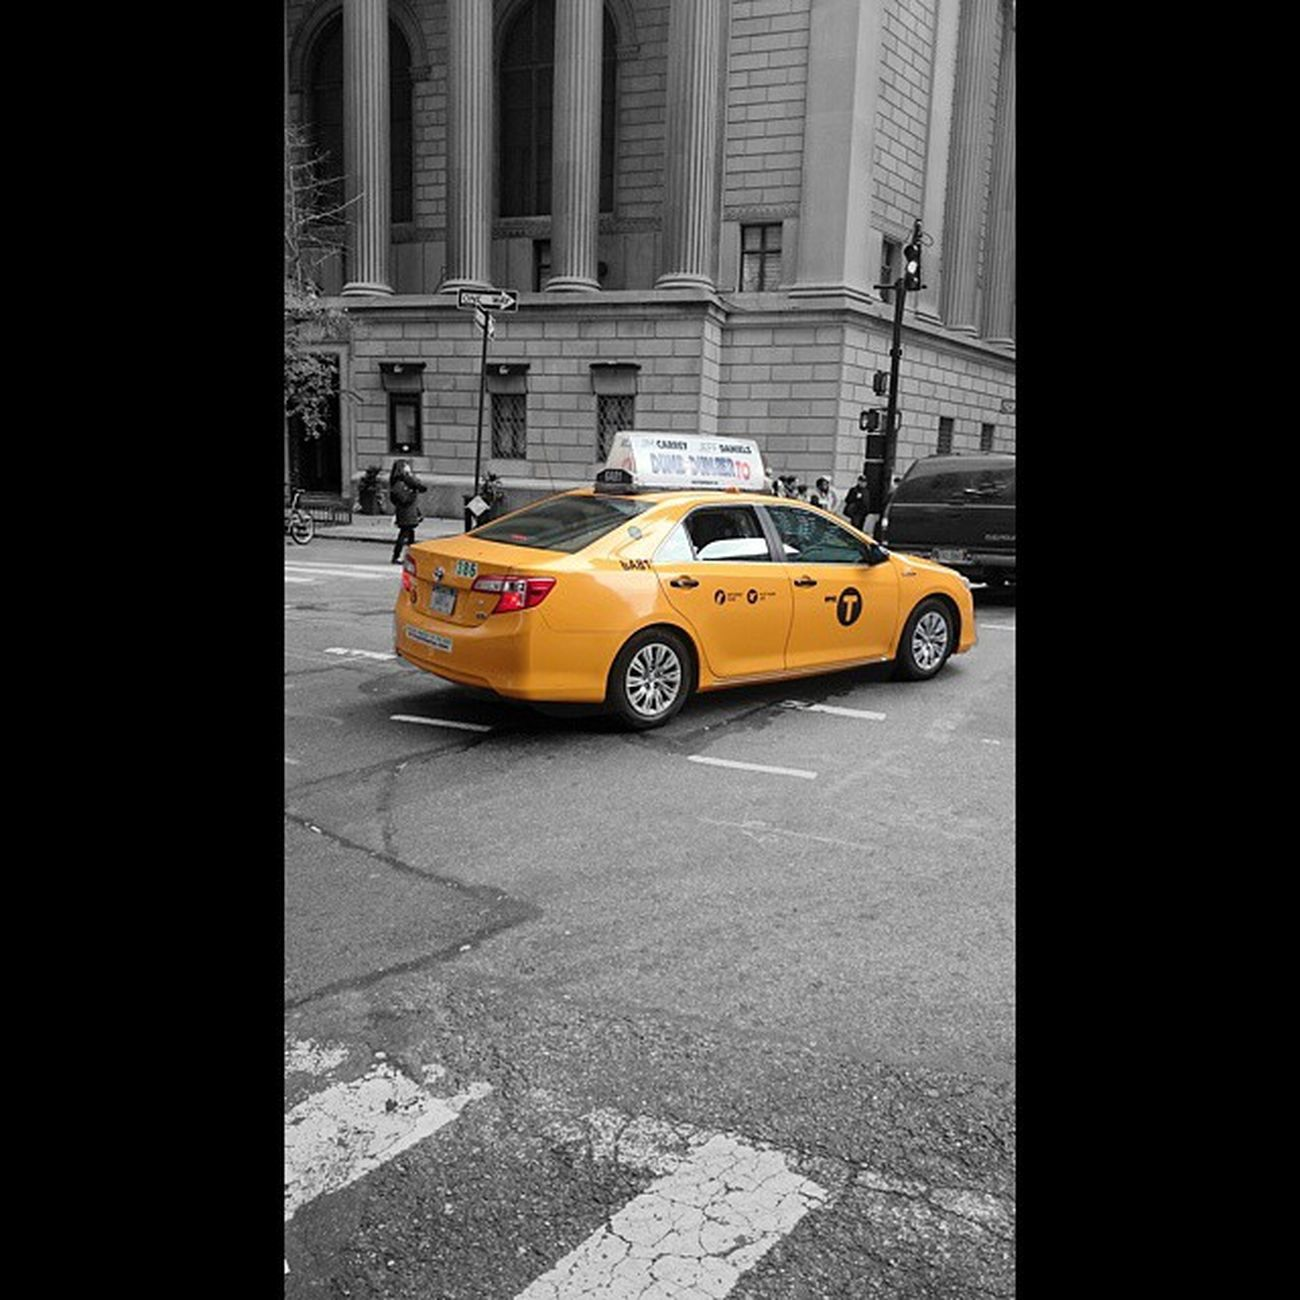 Your typical coloursplash of a New York Yellow Cab!! Colorme_nyc Coloursplash NYC Yellow yellowcabinnycimissnewyorkilovenewyork weareherenycNewyorknewyork